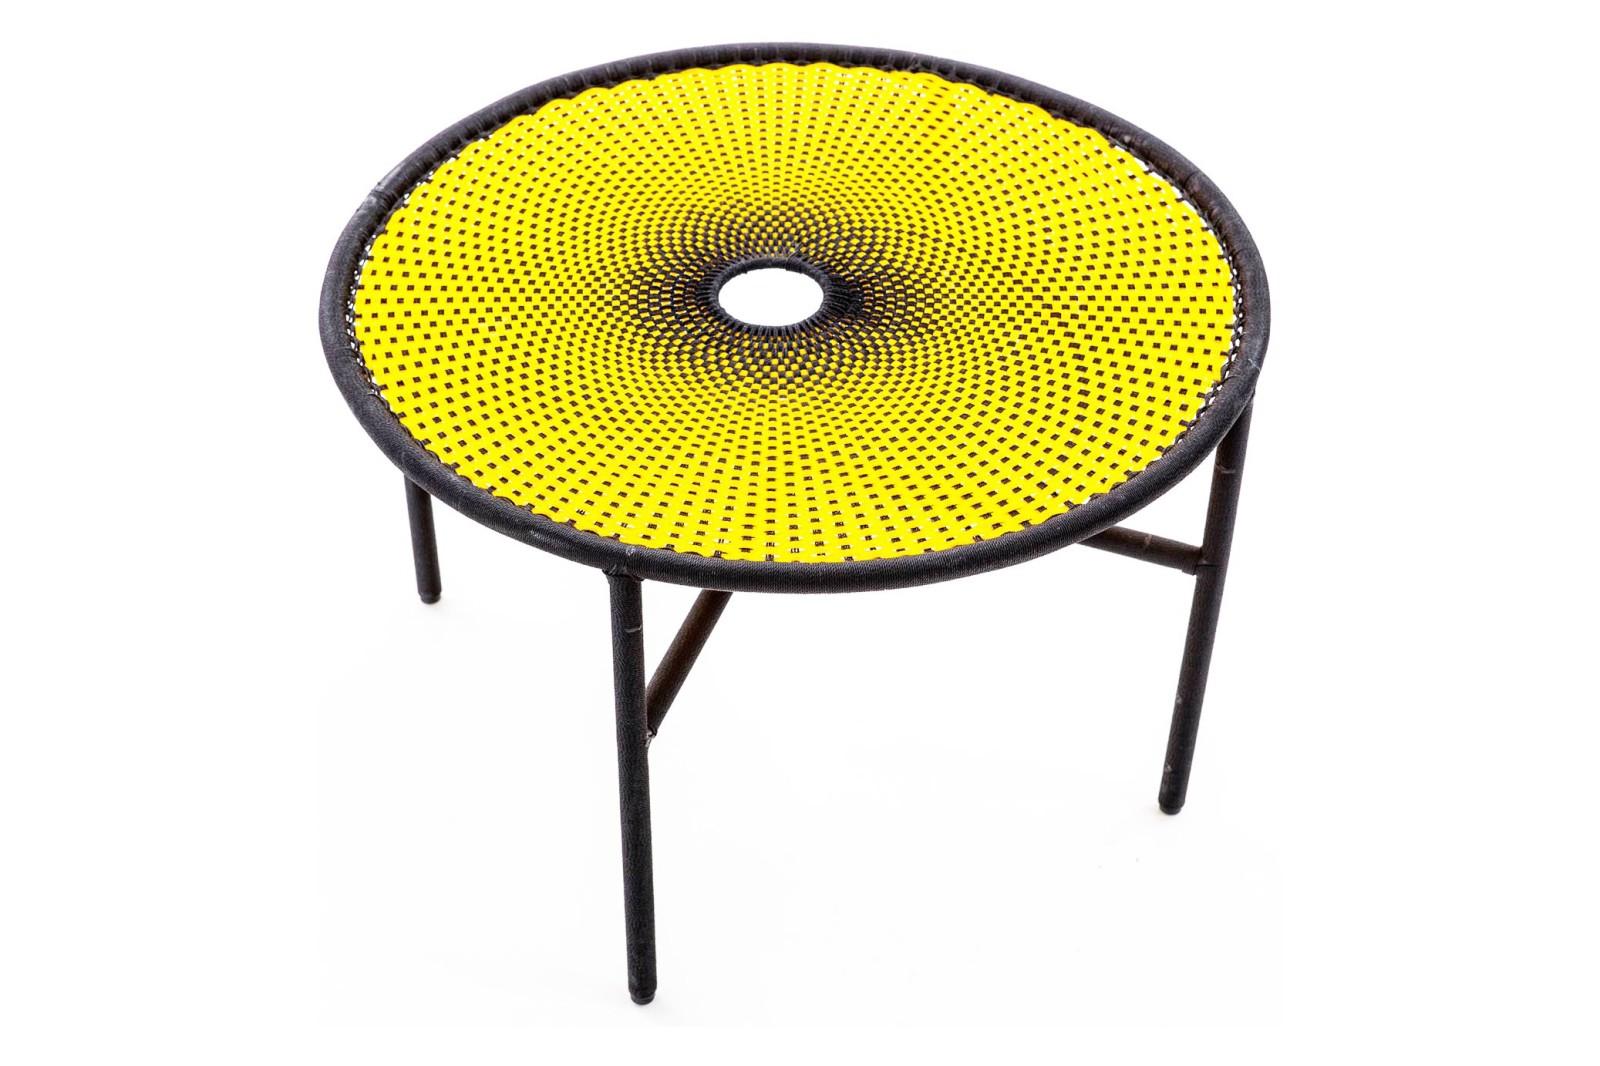 Banjooli Coffee Table Yellow and Black, Large